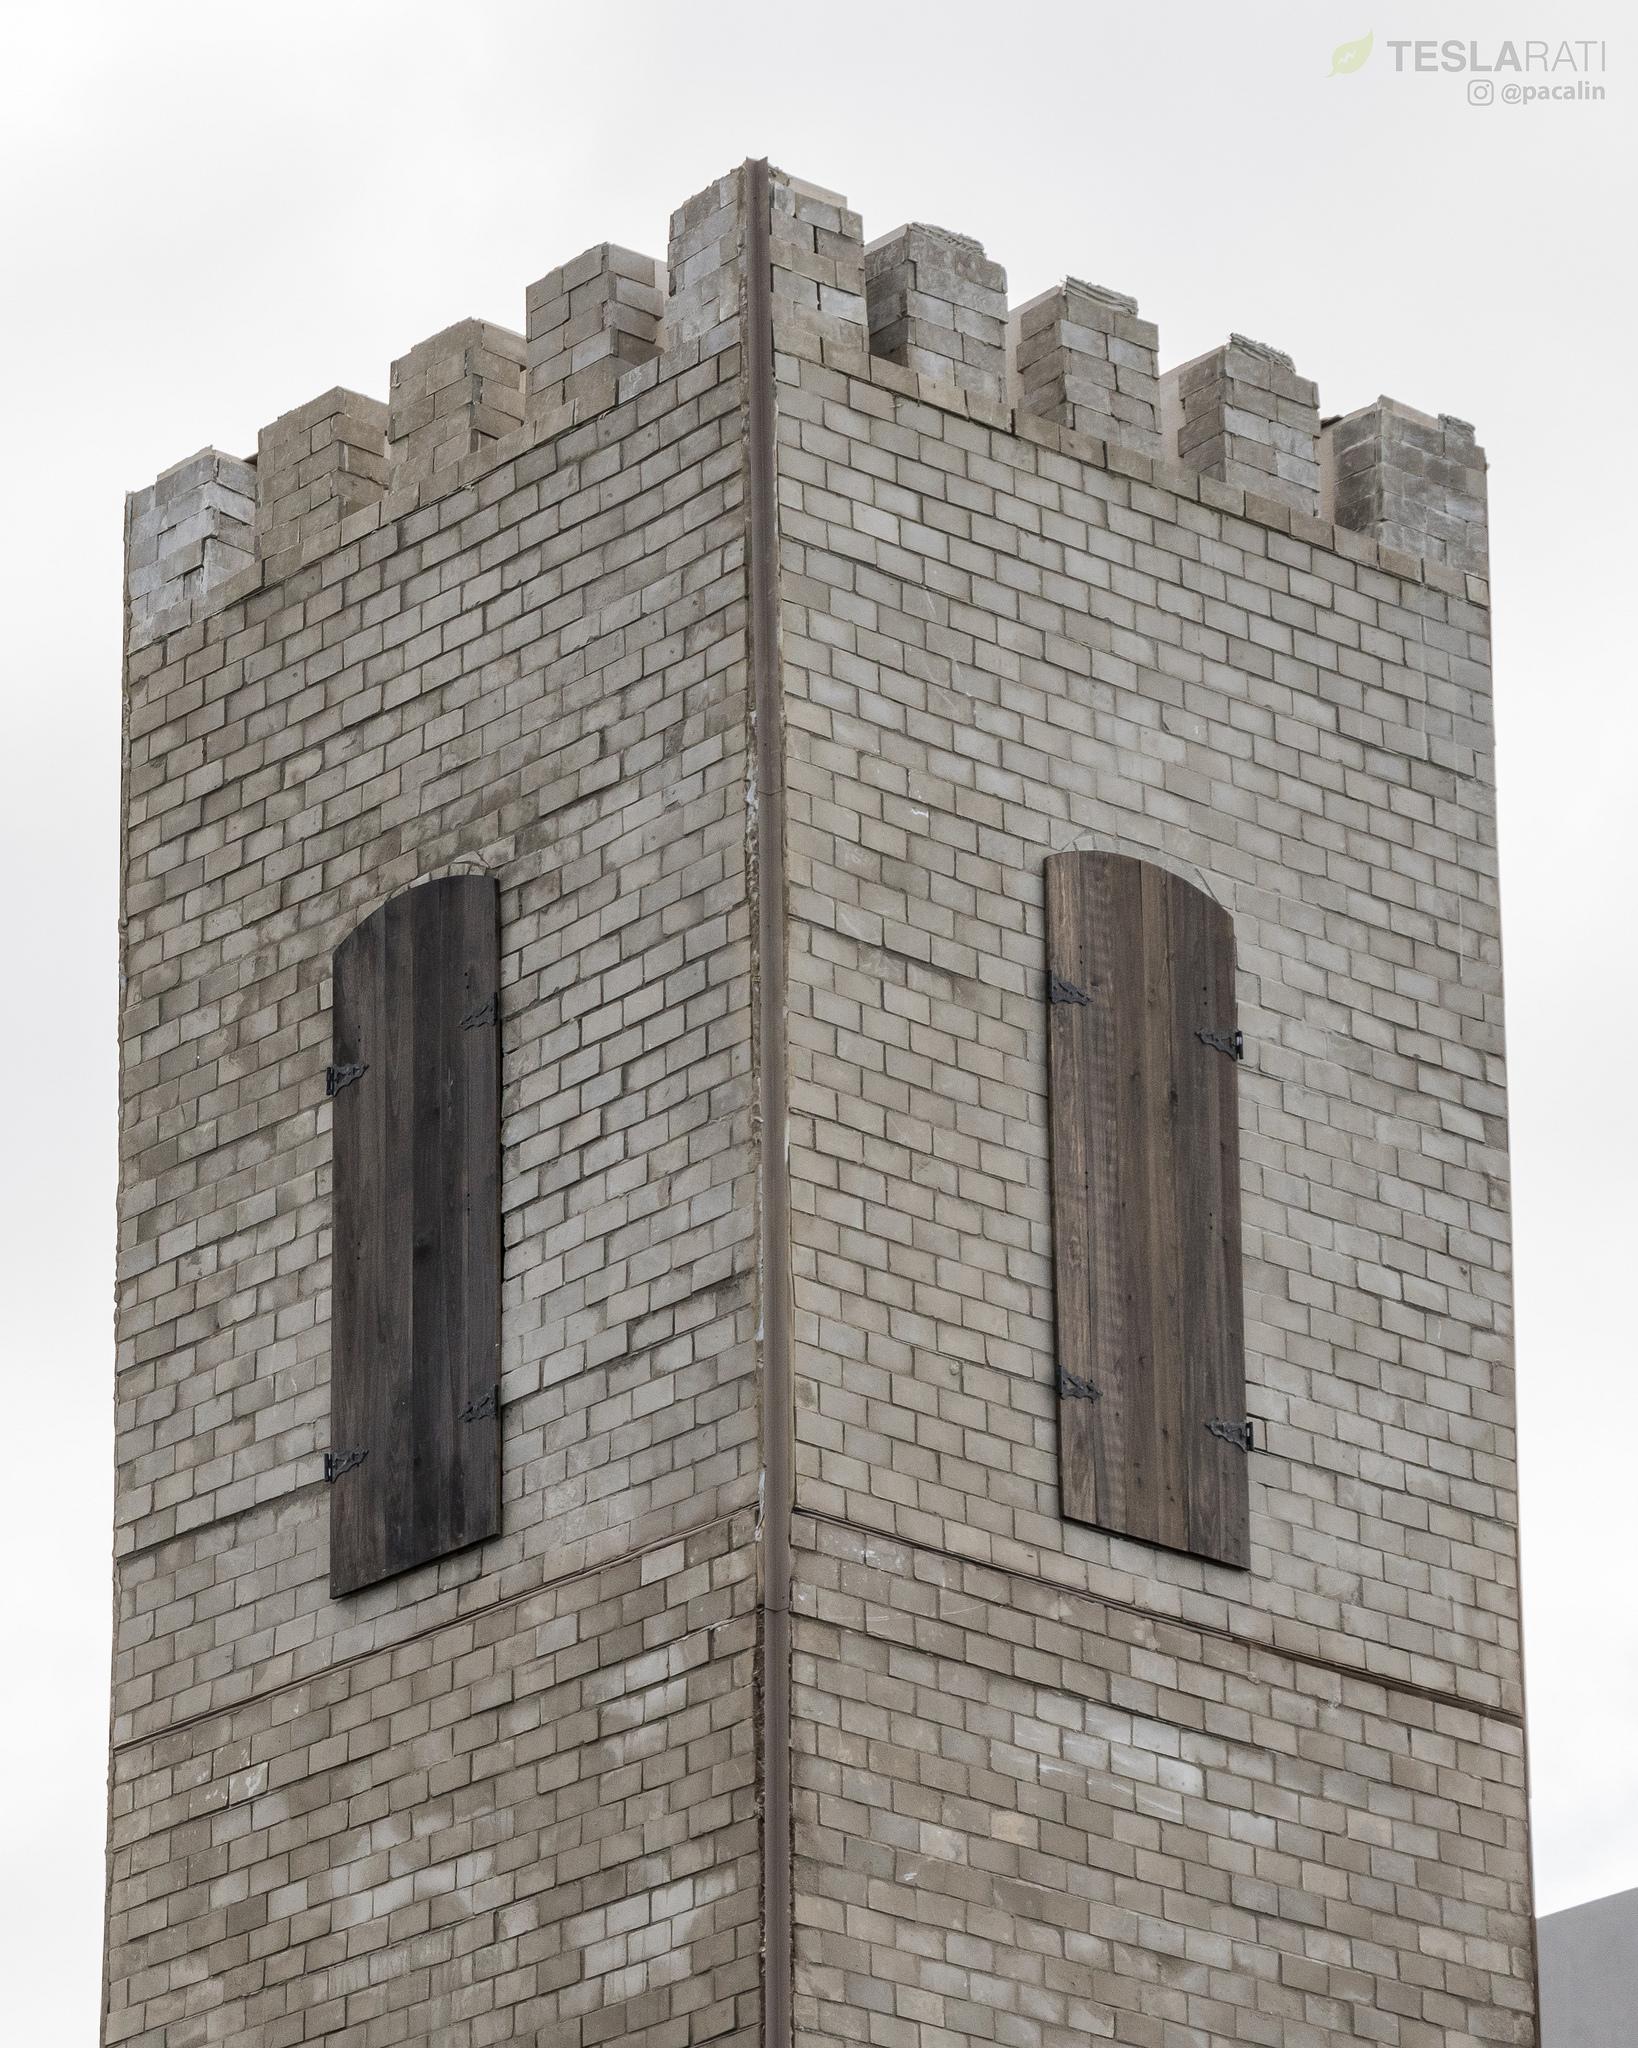 TBC-watchtower-complete-Pauline-Acalin-12172018-9